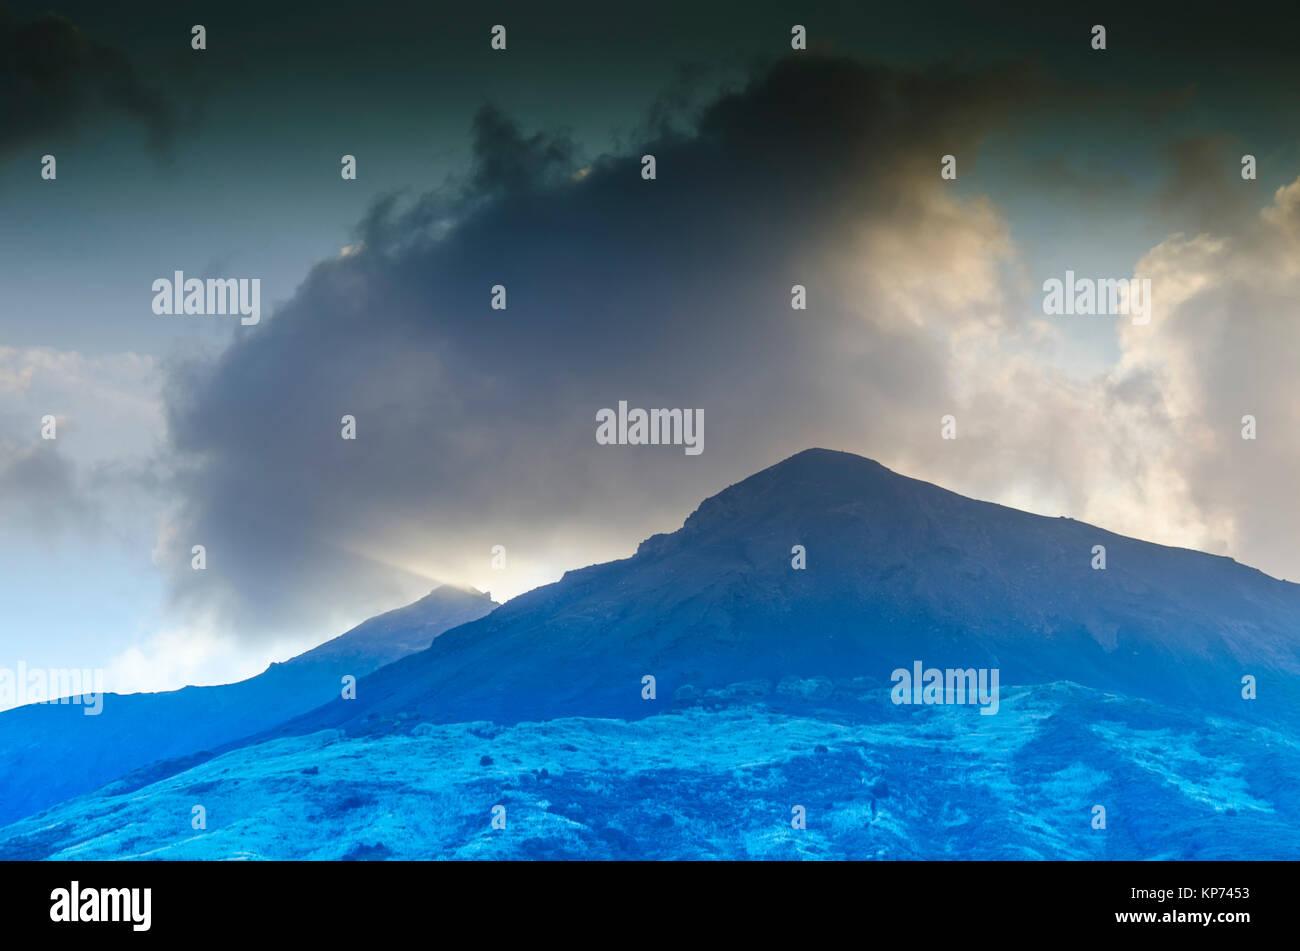 Top of the stromboli volcano surrounded by its fumaroles island stromboli italy - Stock Image